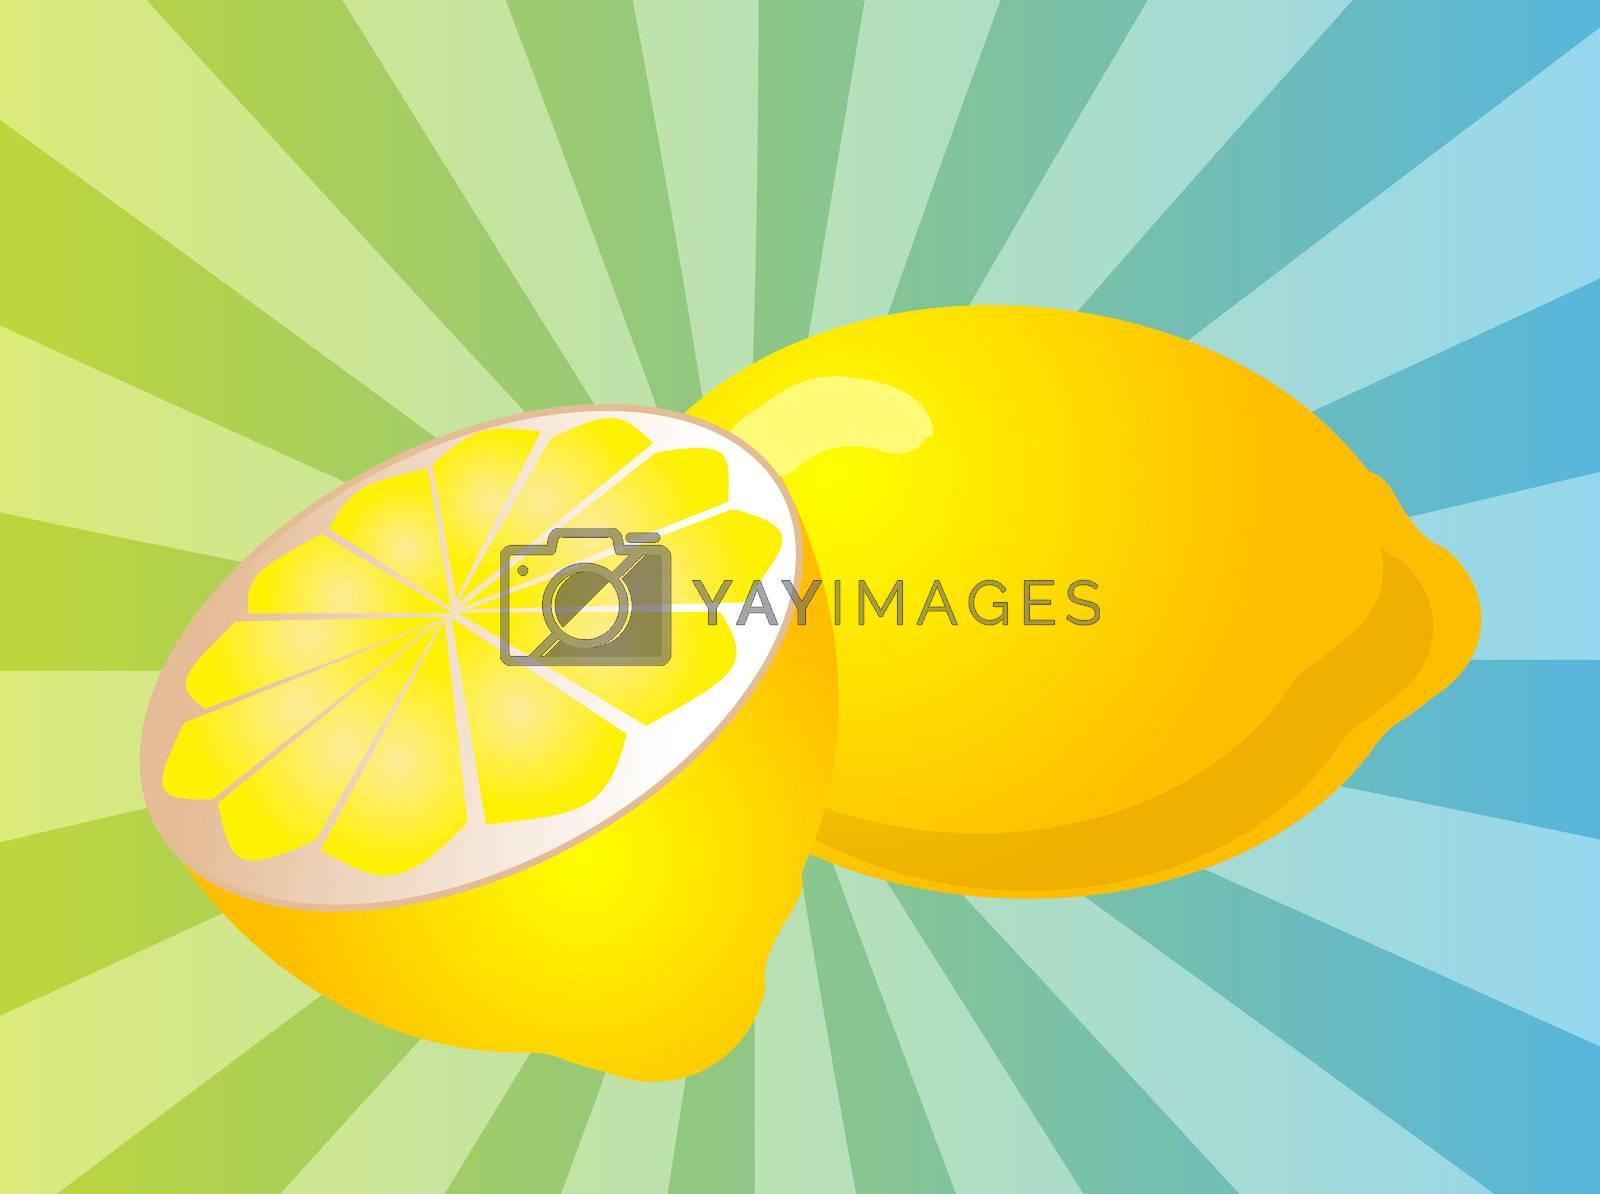 Royalty free image of Lemon fruit  illustration by kgtoh